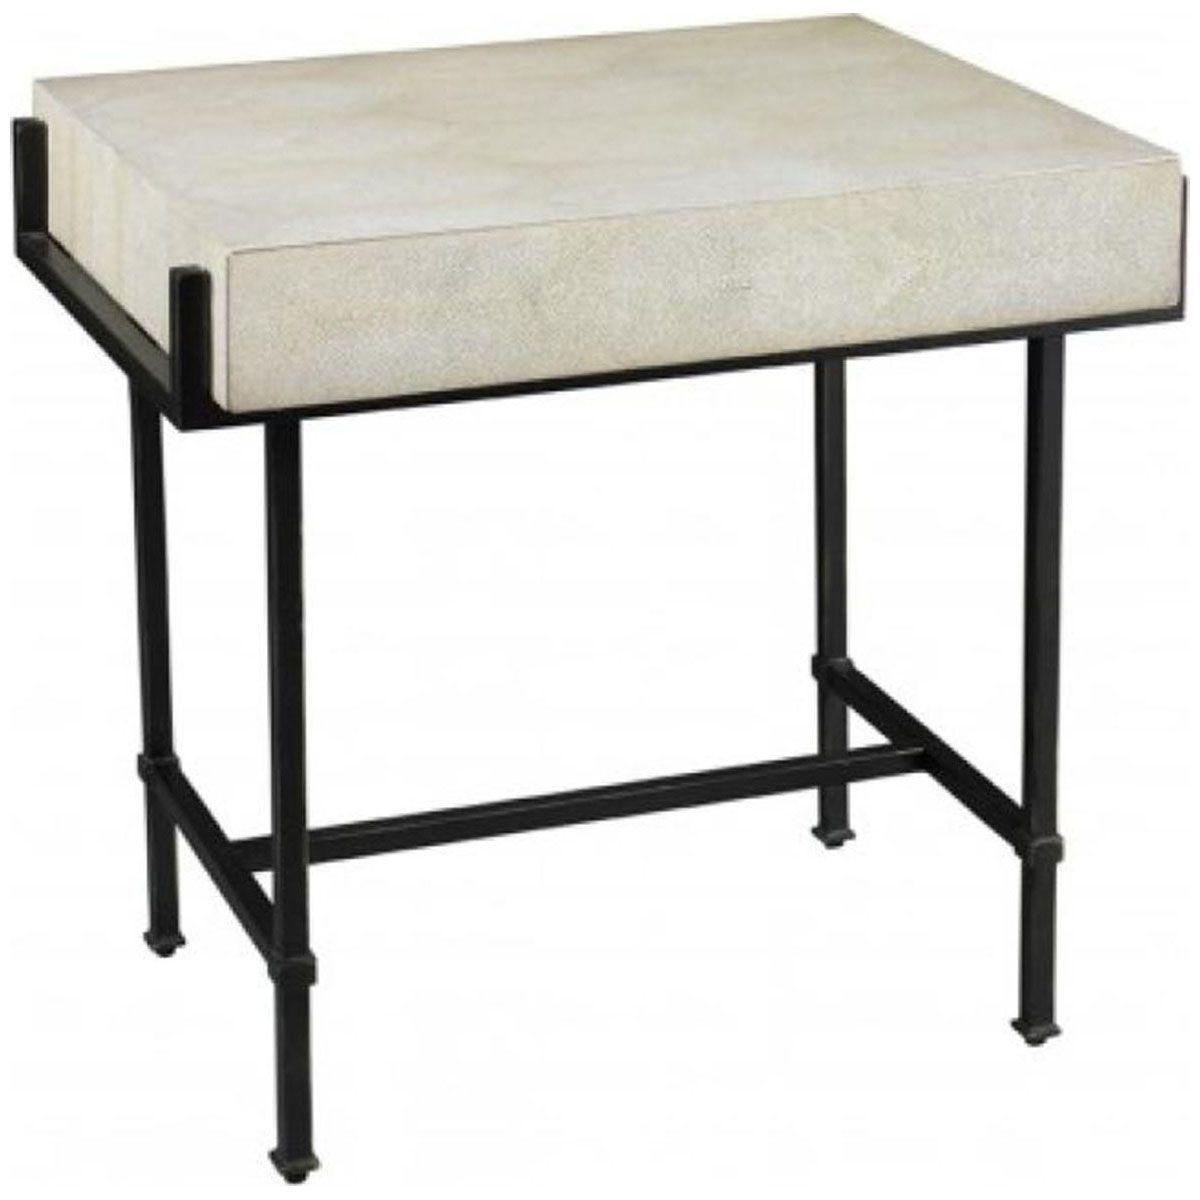 Lillian August Simone Side Table | Lillian August | Pinterest ...